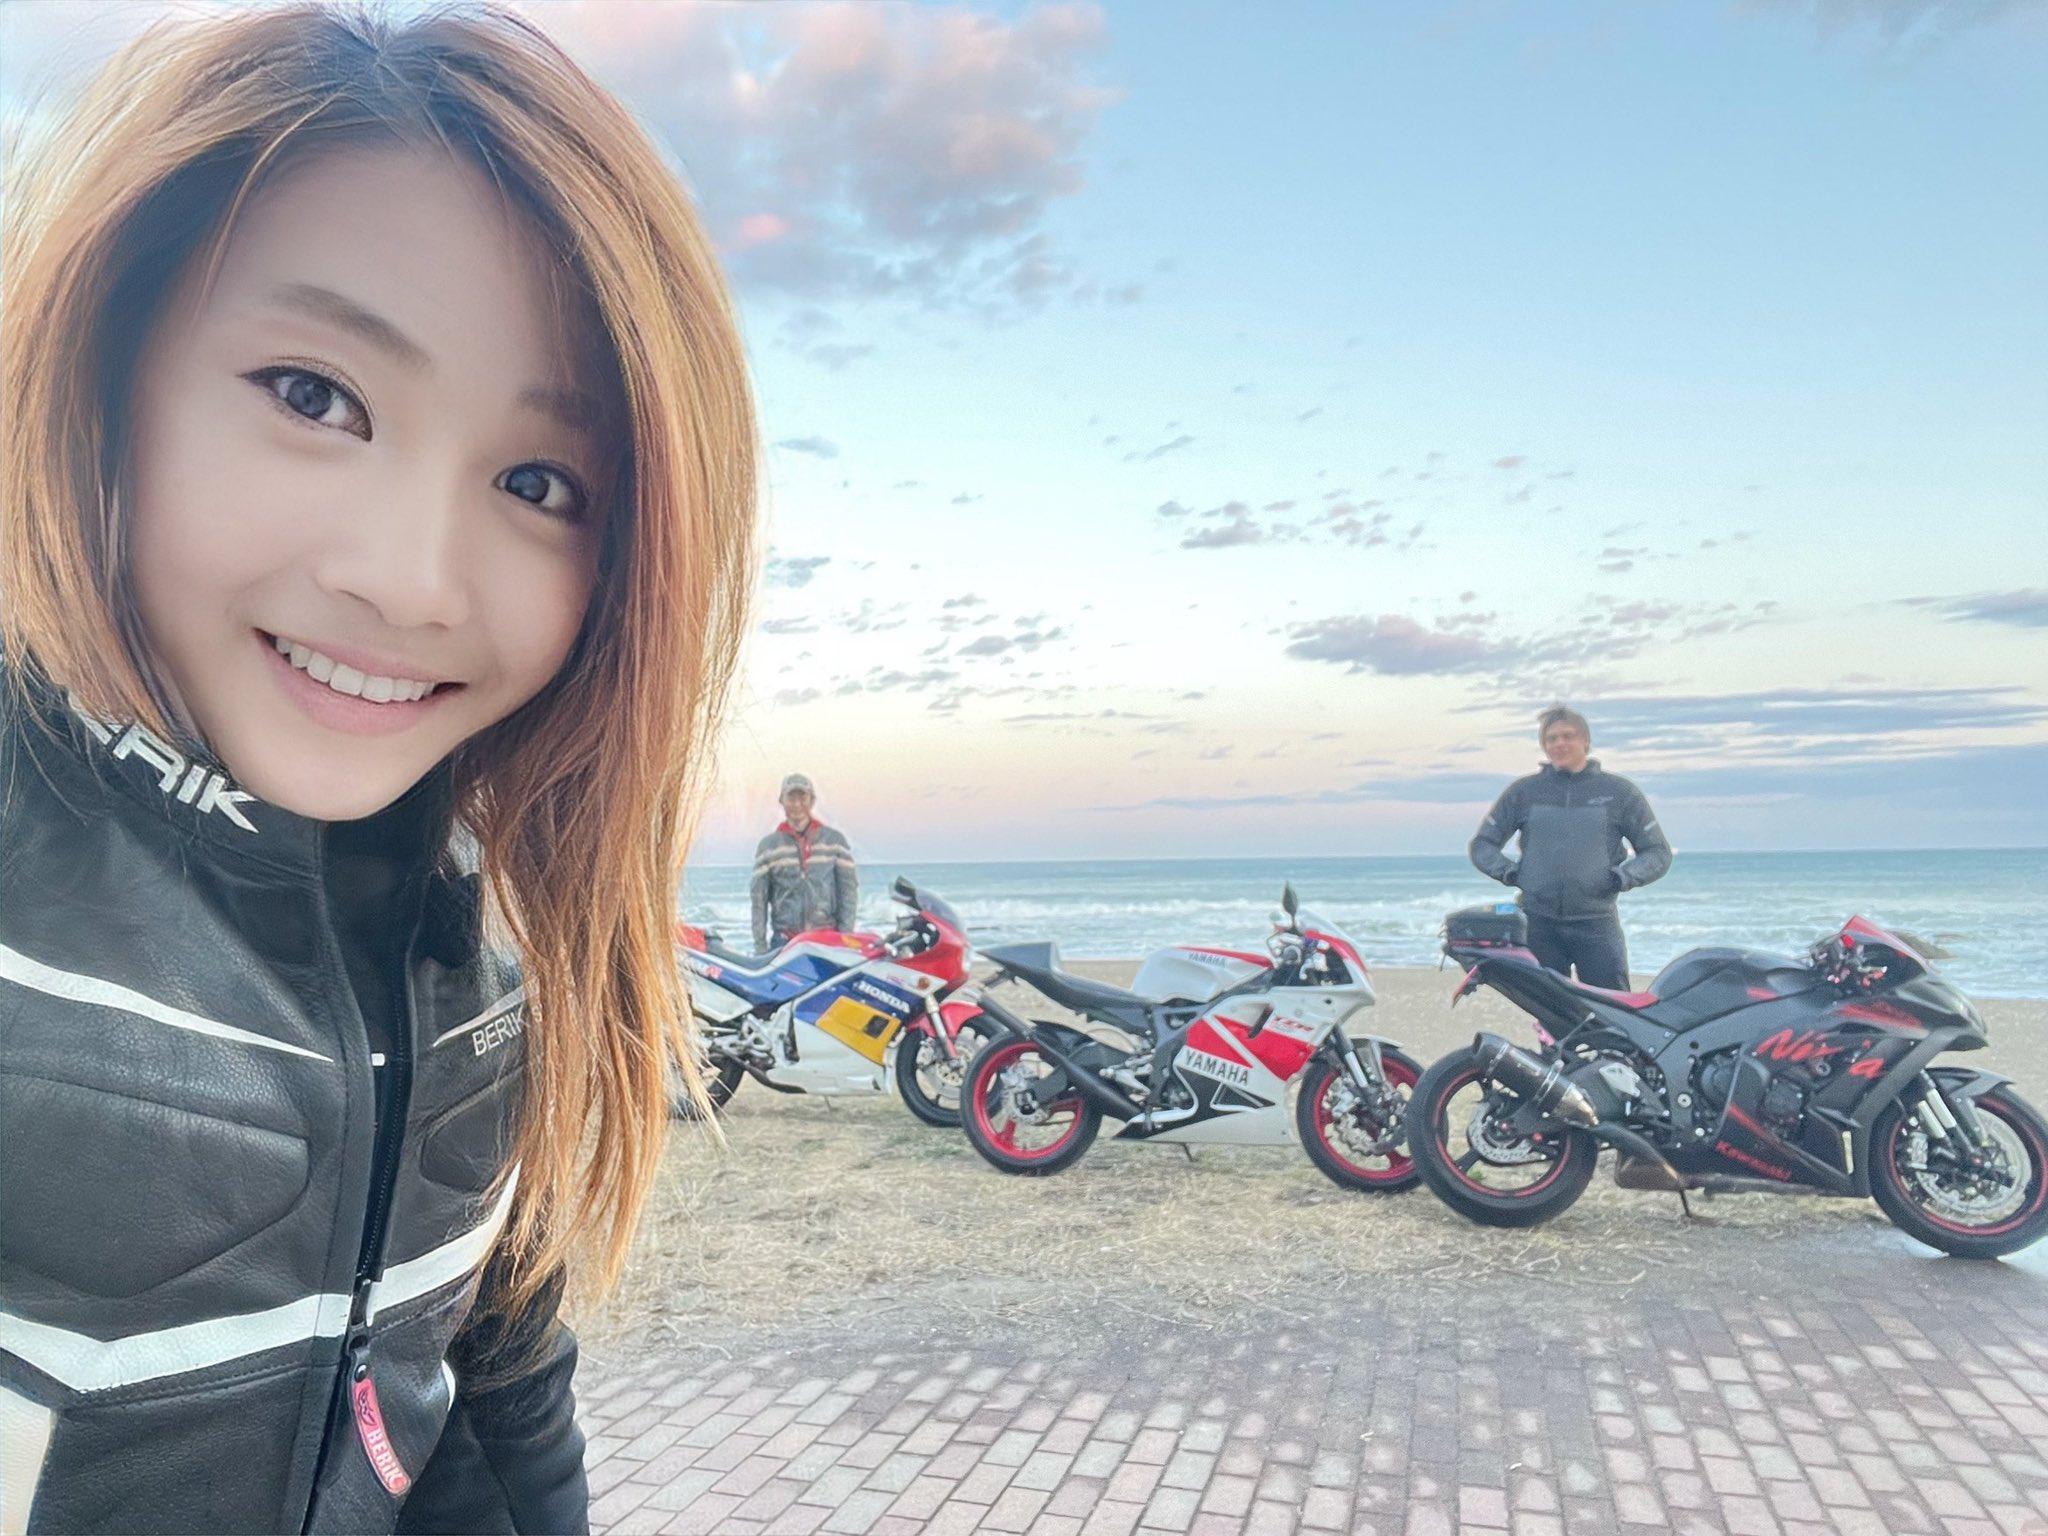 Японская байкерша